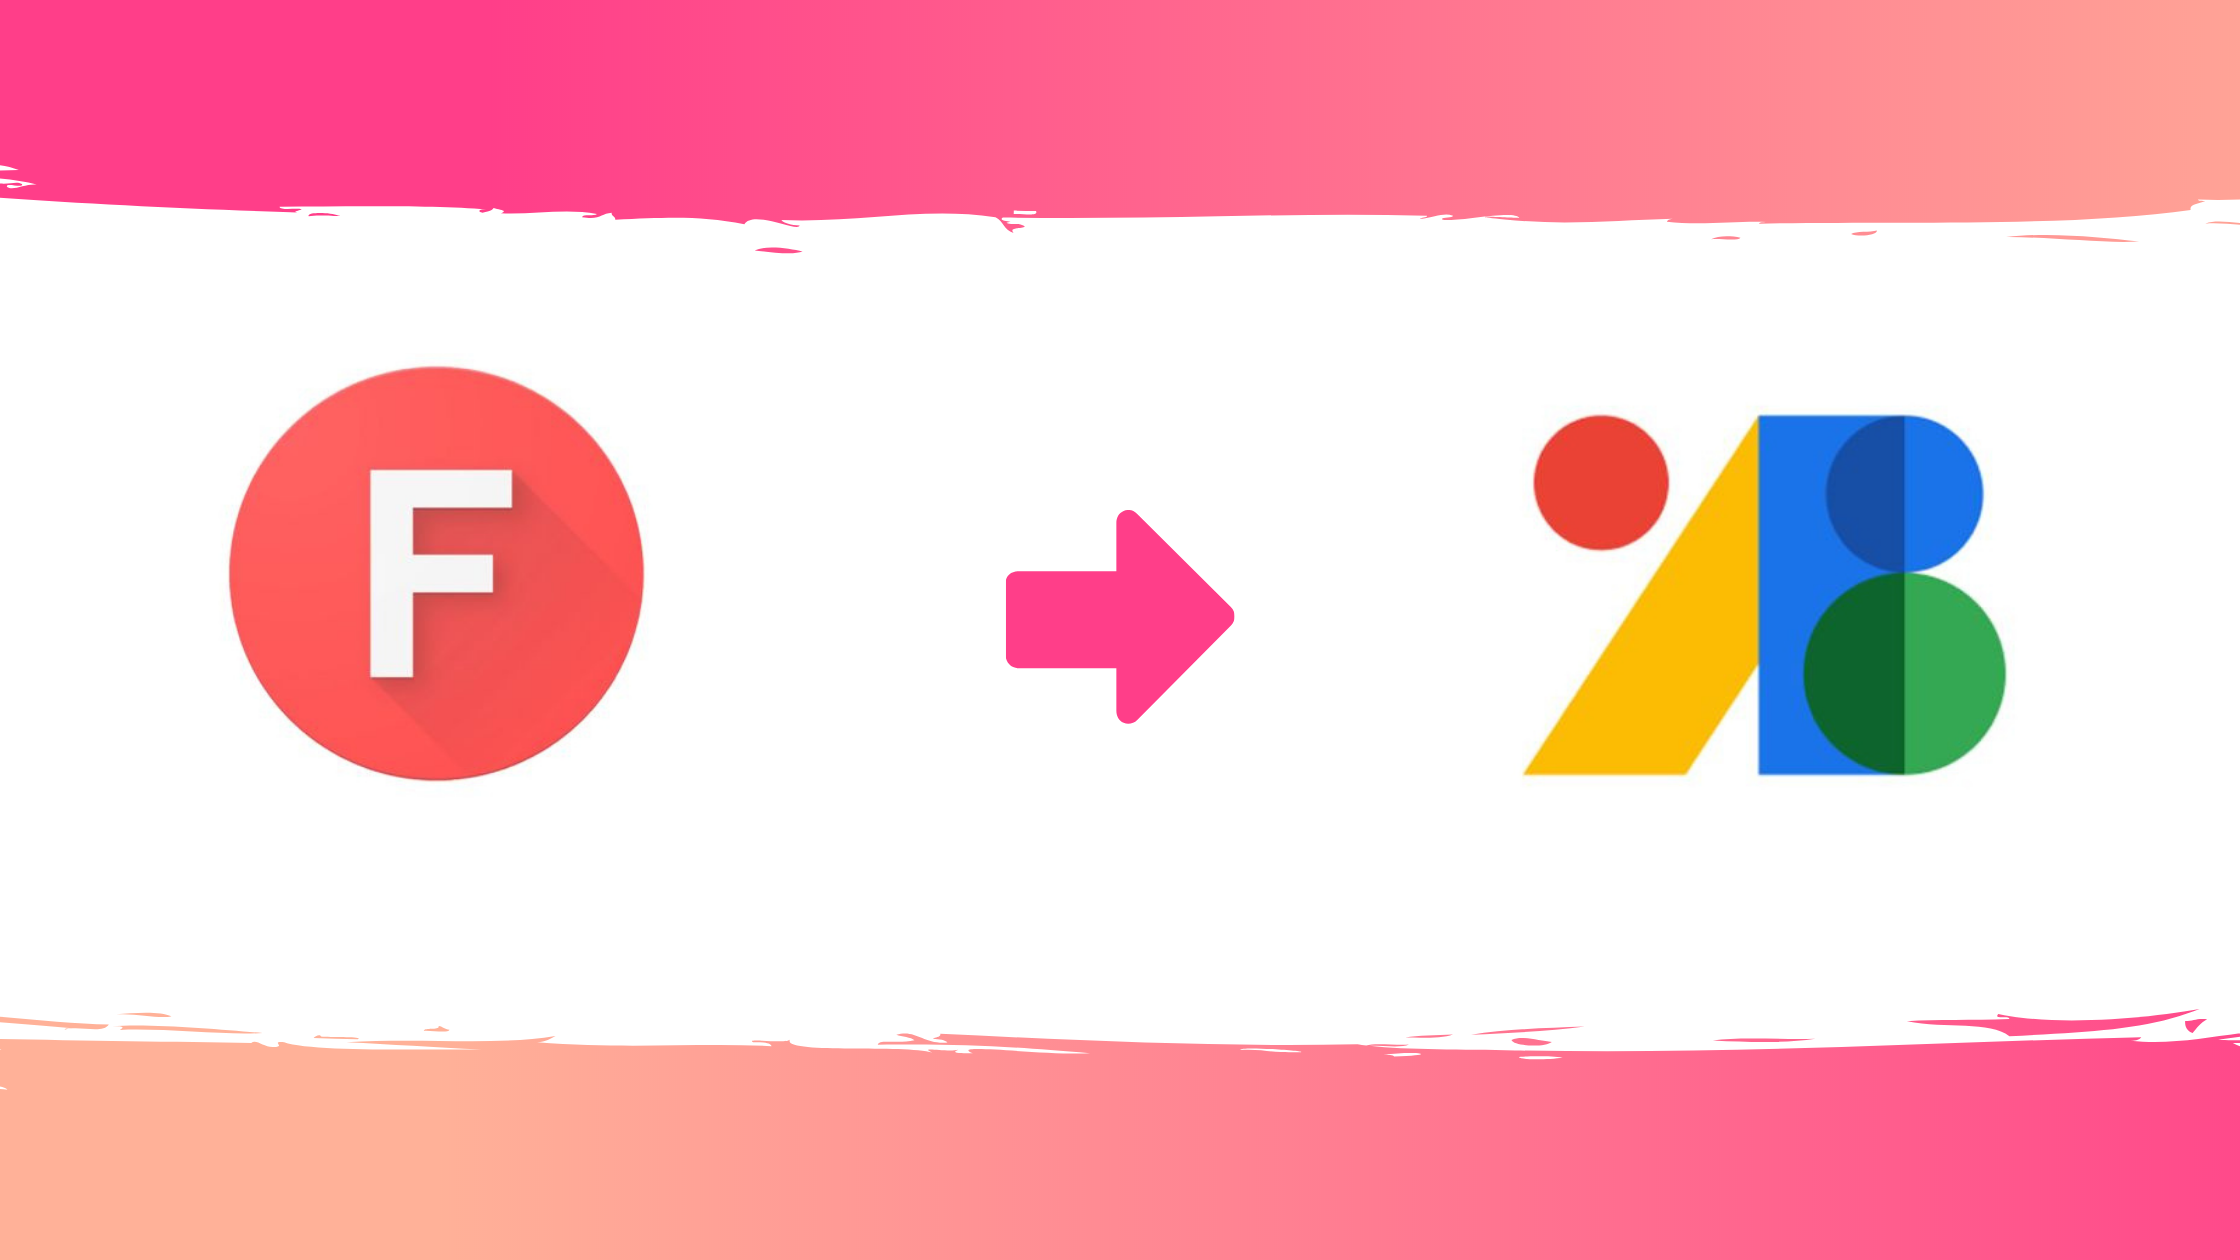 Google Fonts icon has new design